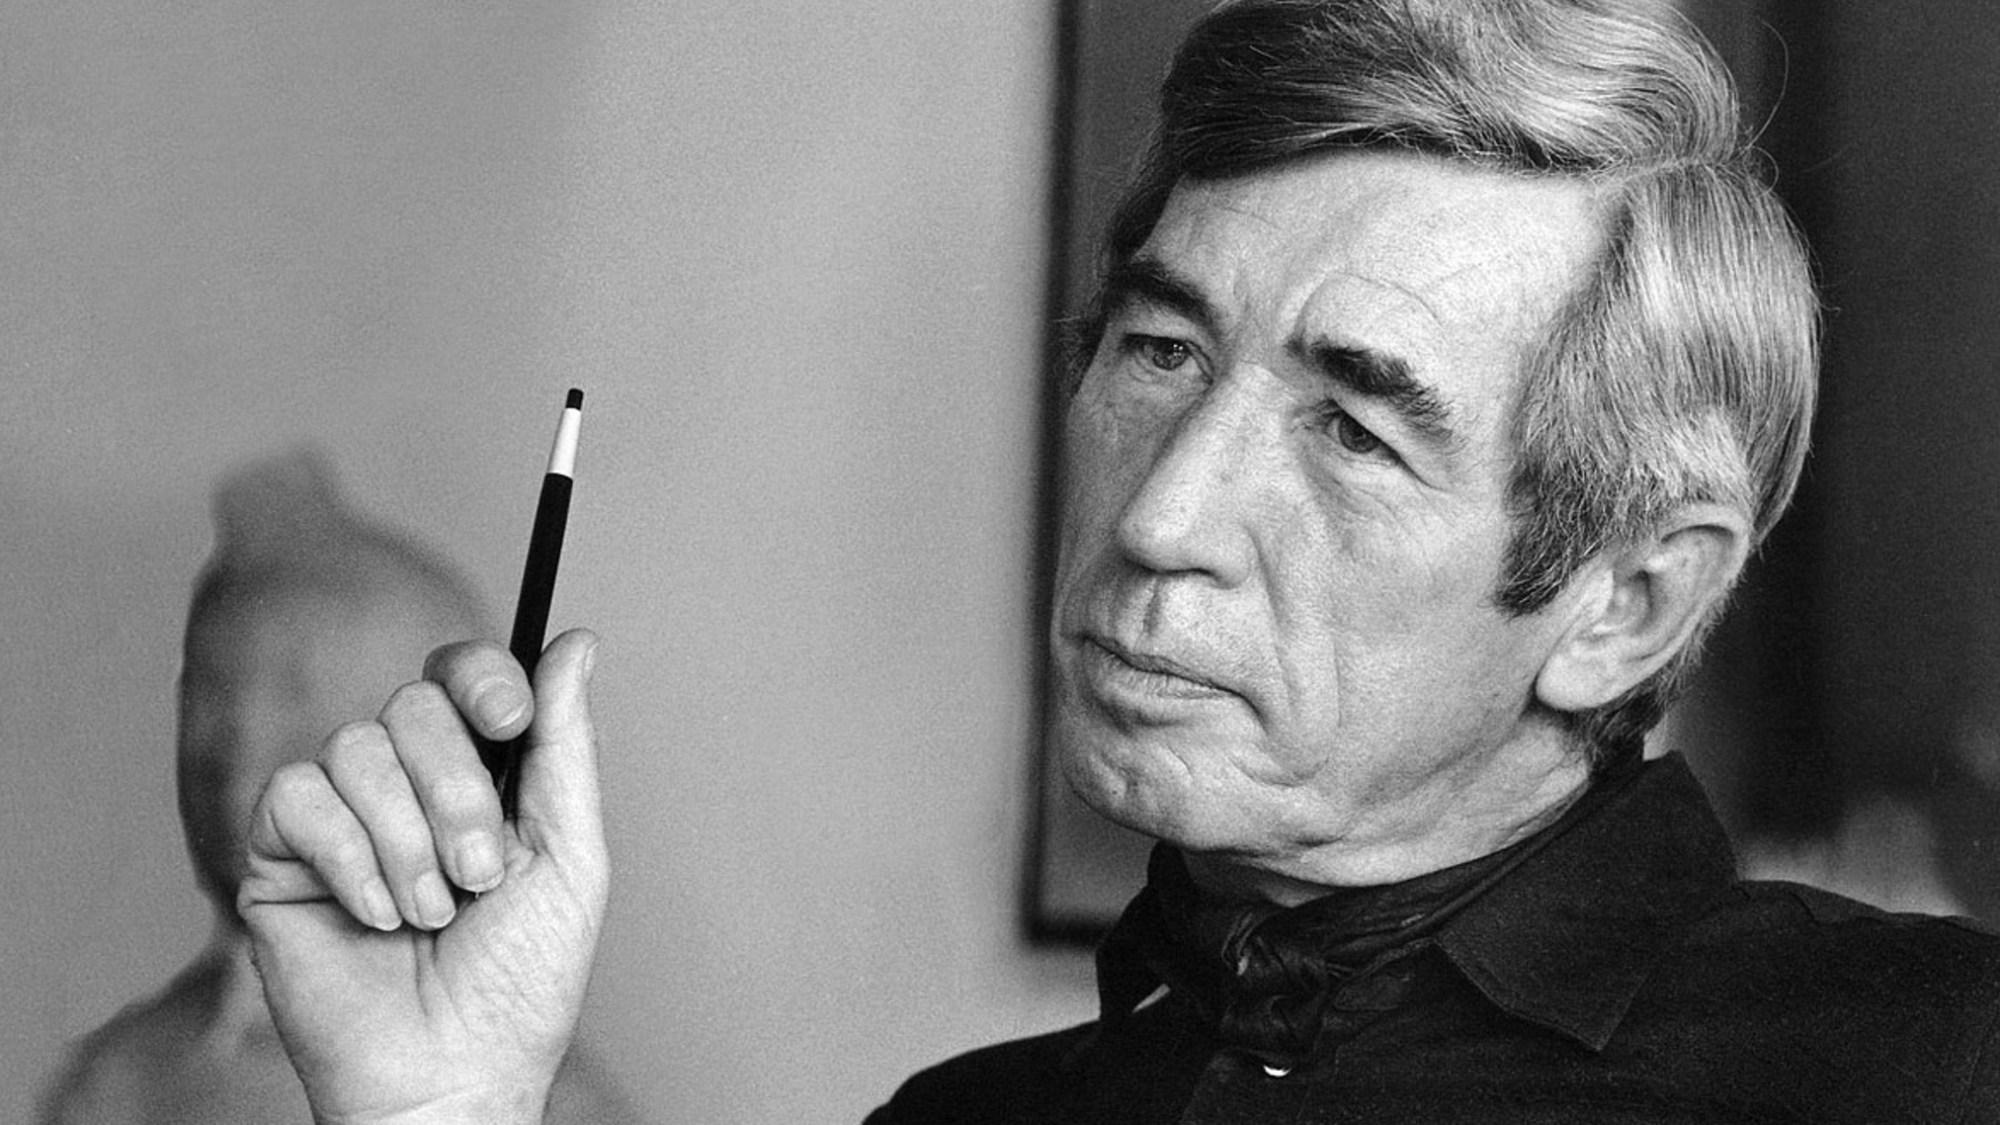 Georges Remi, alias Hergé